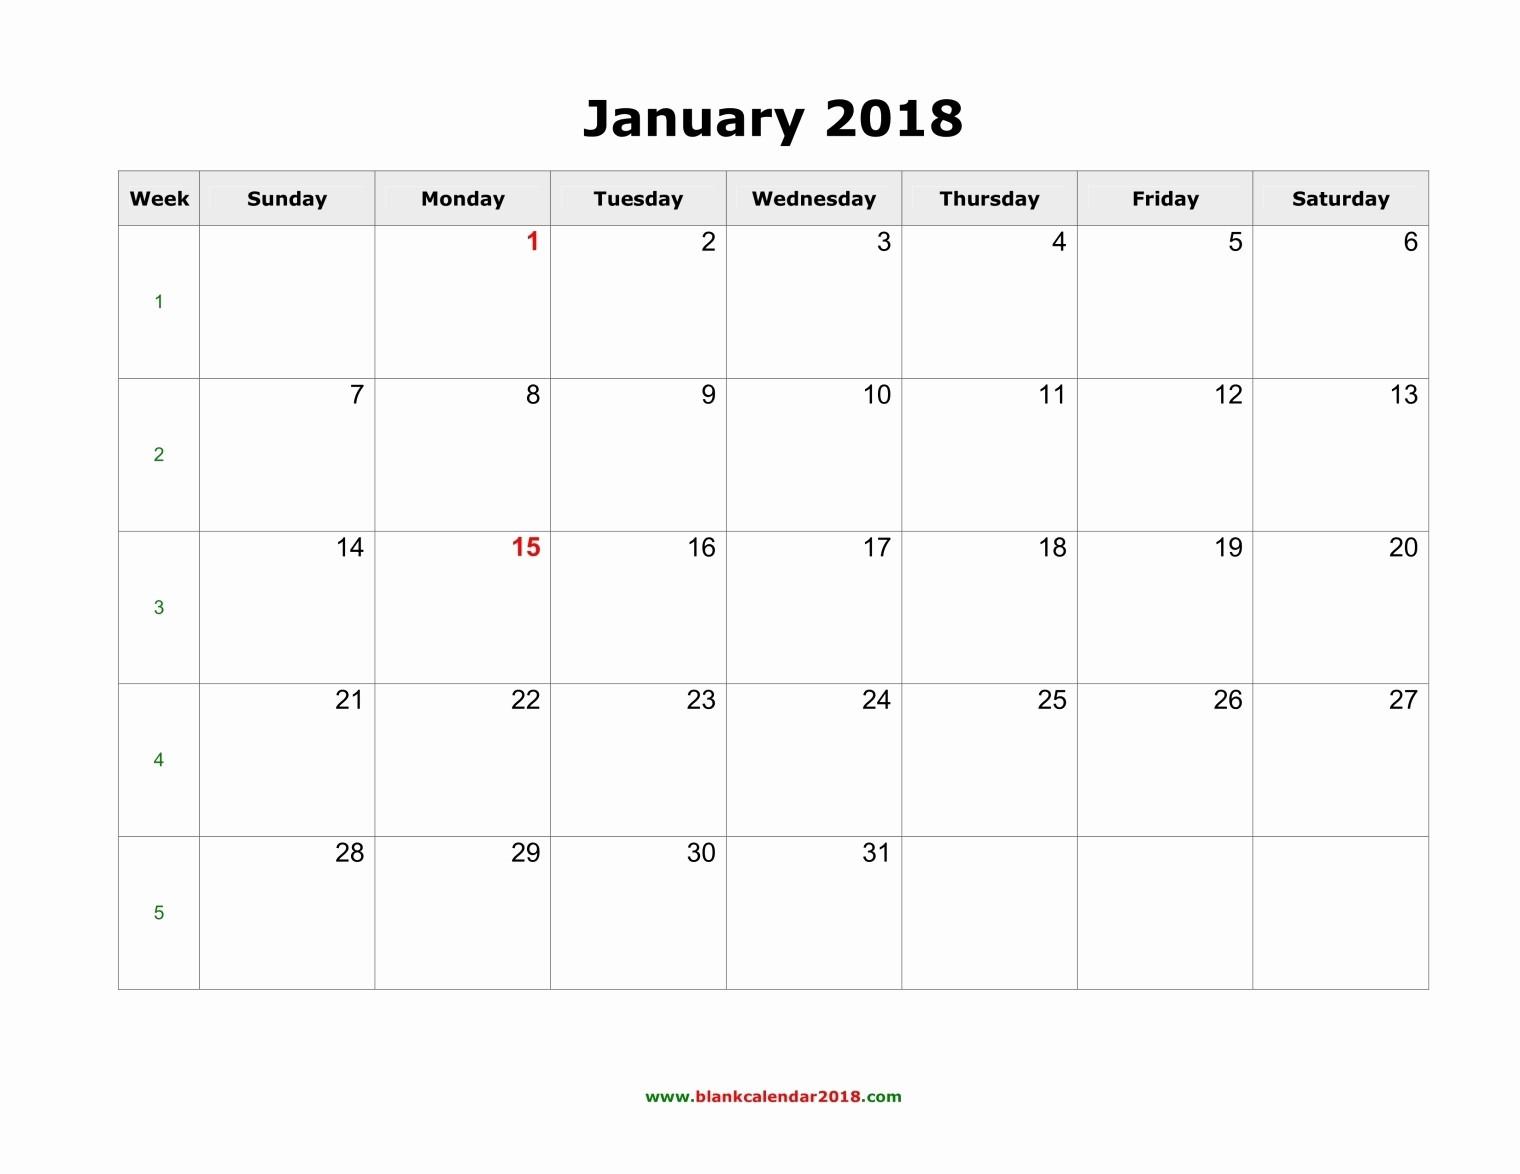 Blank January 2018 Calendar Printable Awesome Blank Calendar 2018